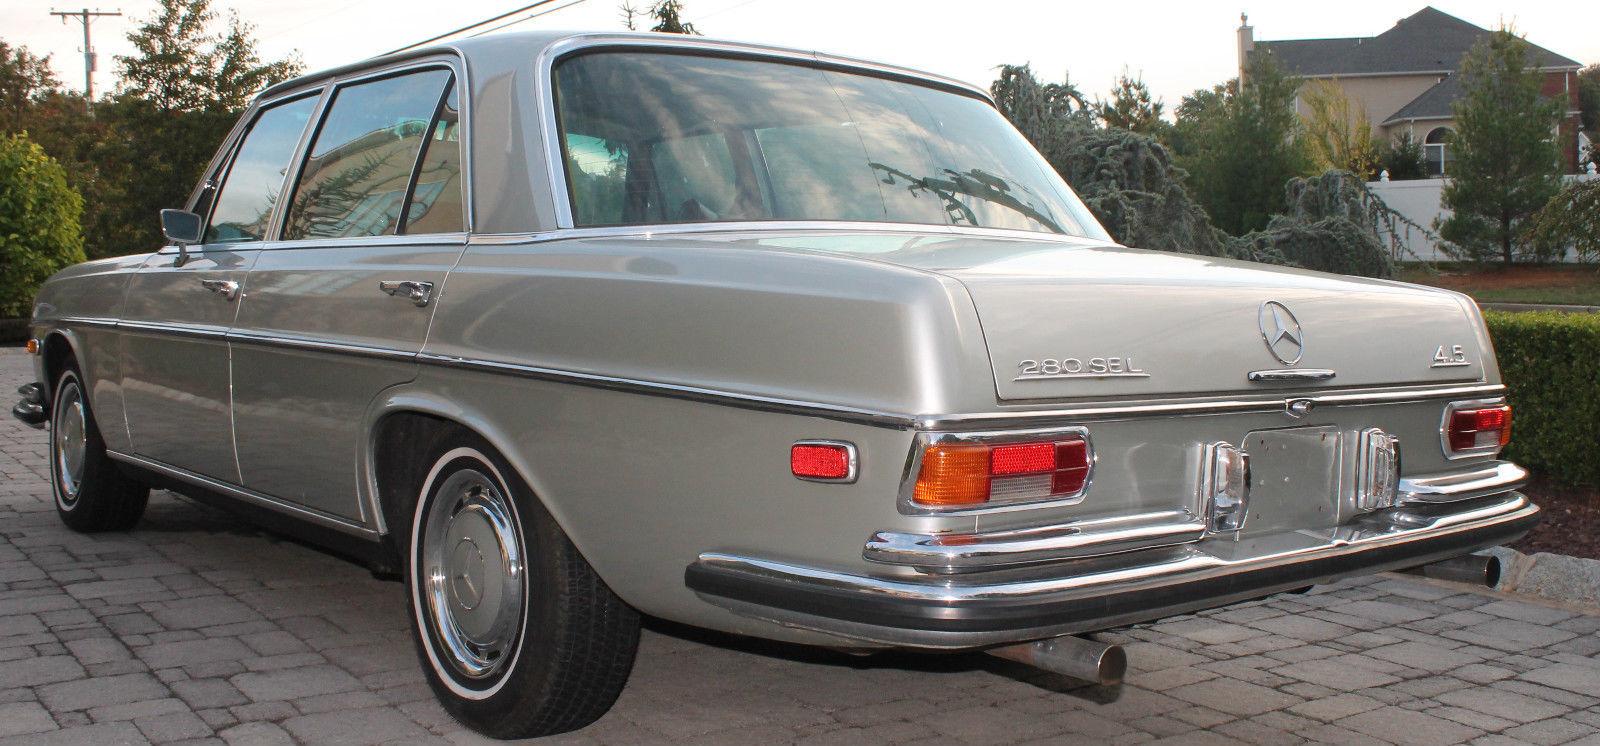 1973 mercedes benz 280sel 4 5 liter 94k 108 floor shift for Mercedes benz 5 series